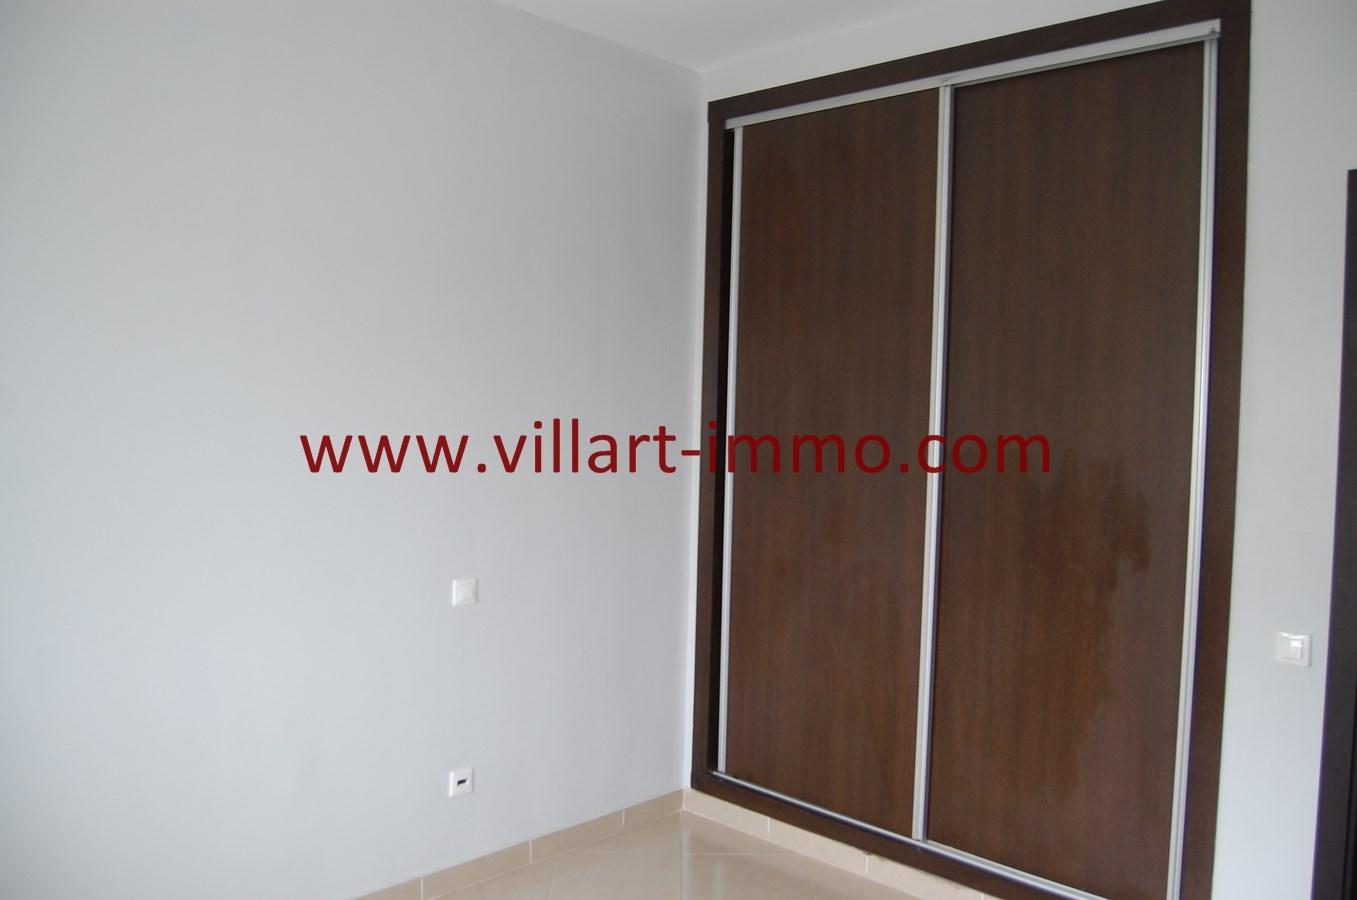 4-Vente-Appartement-Tanger-Route-de-Rabat-Chambre 3-VA474-Villart Immo